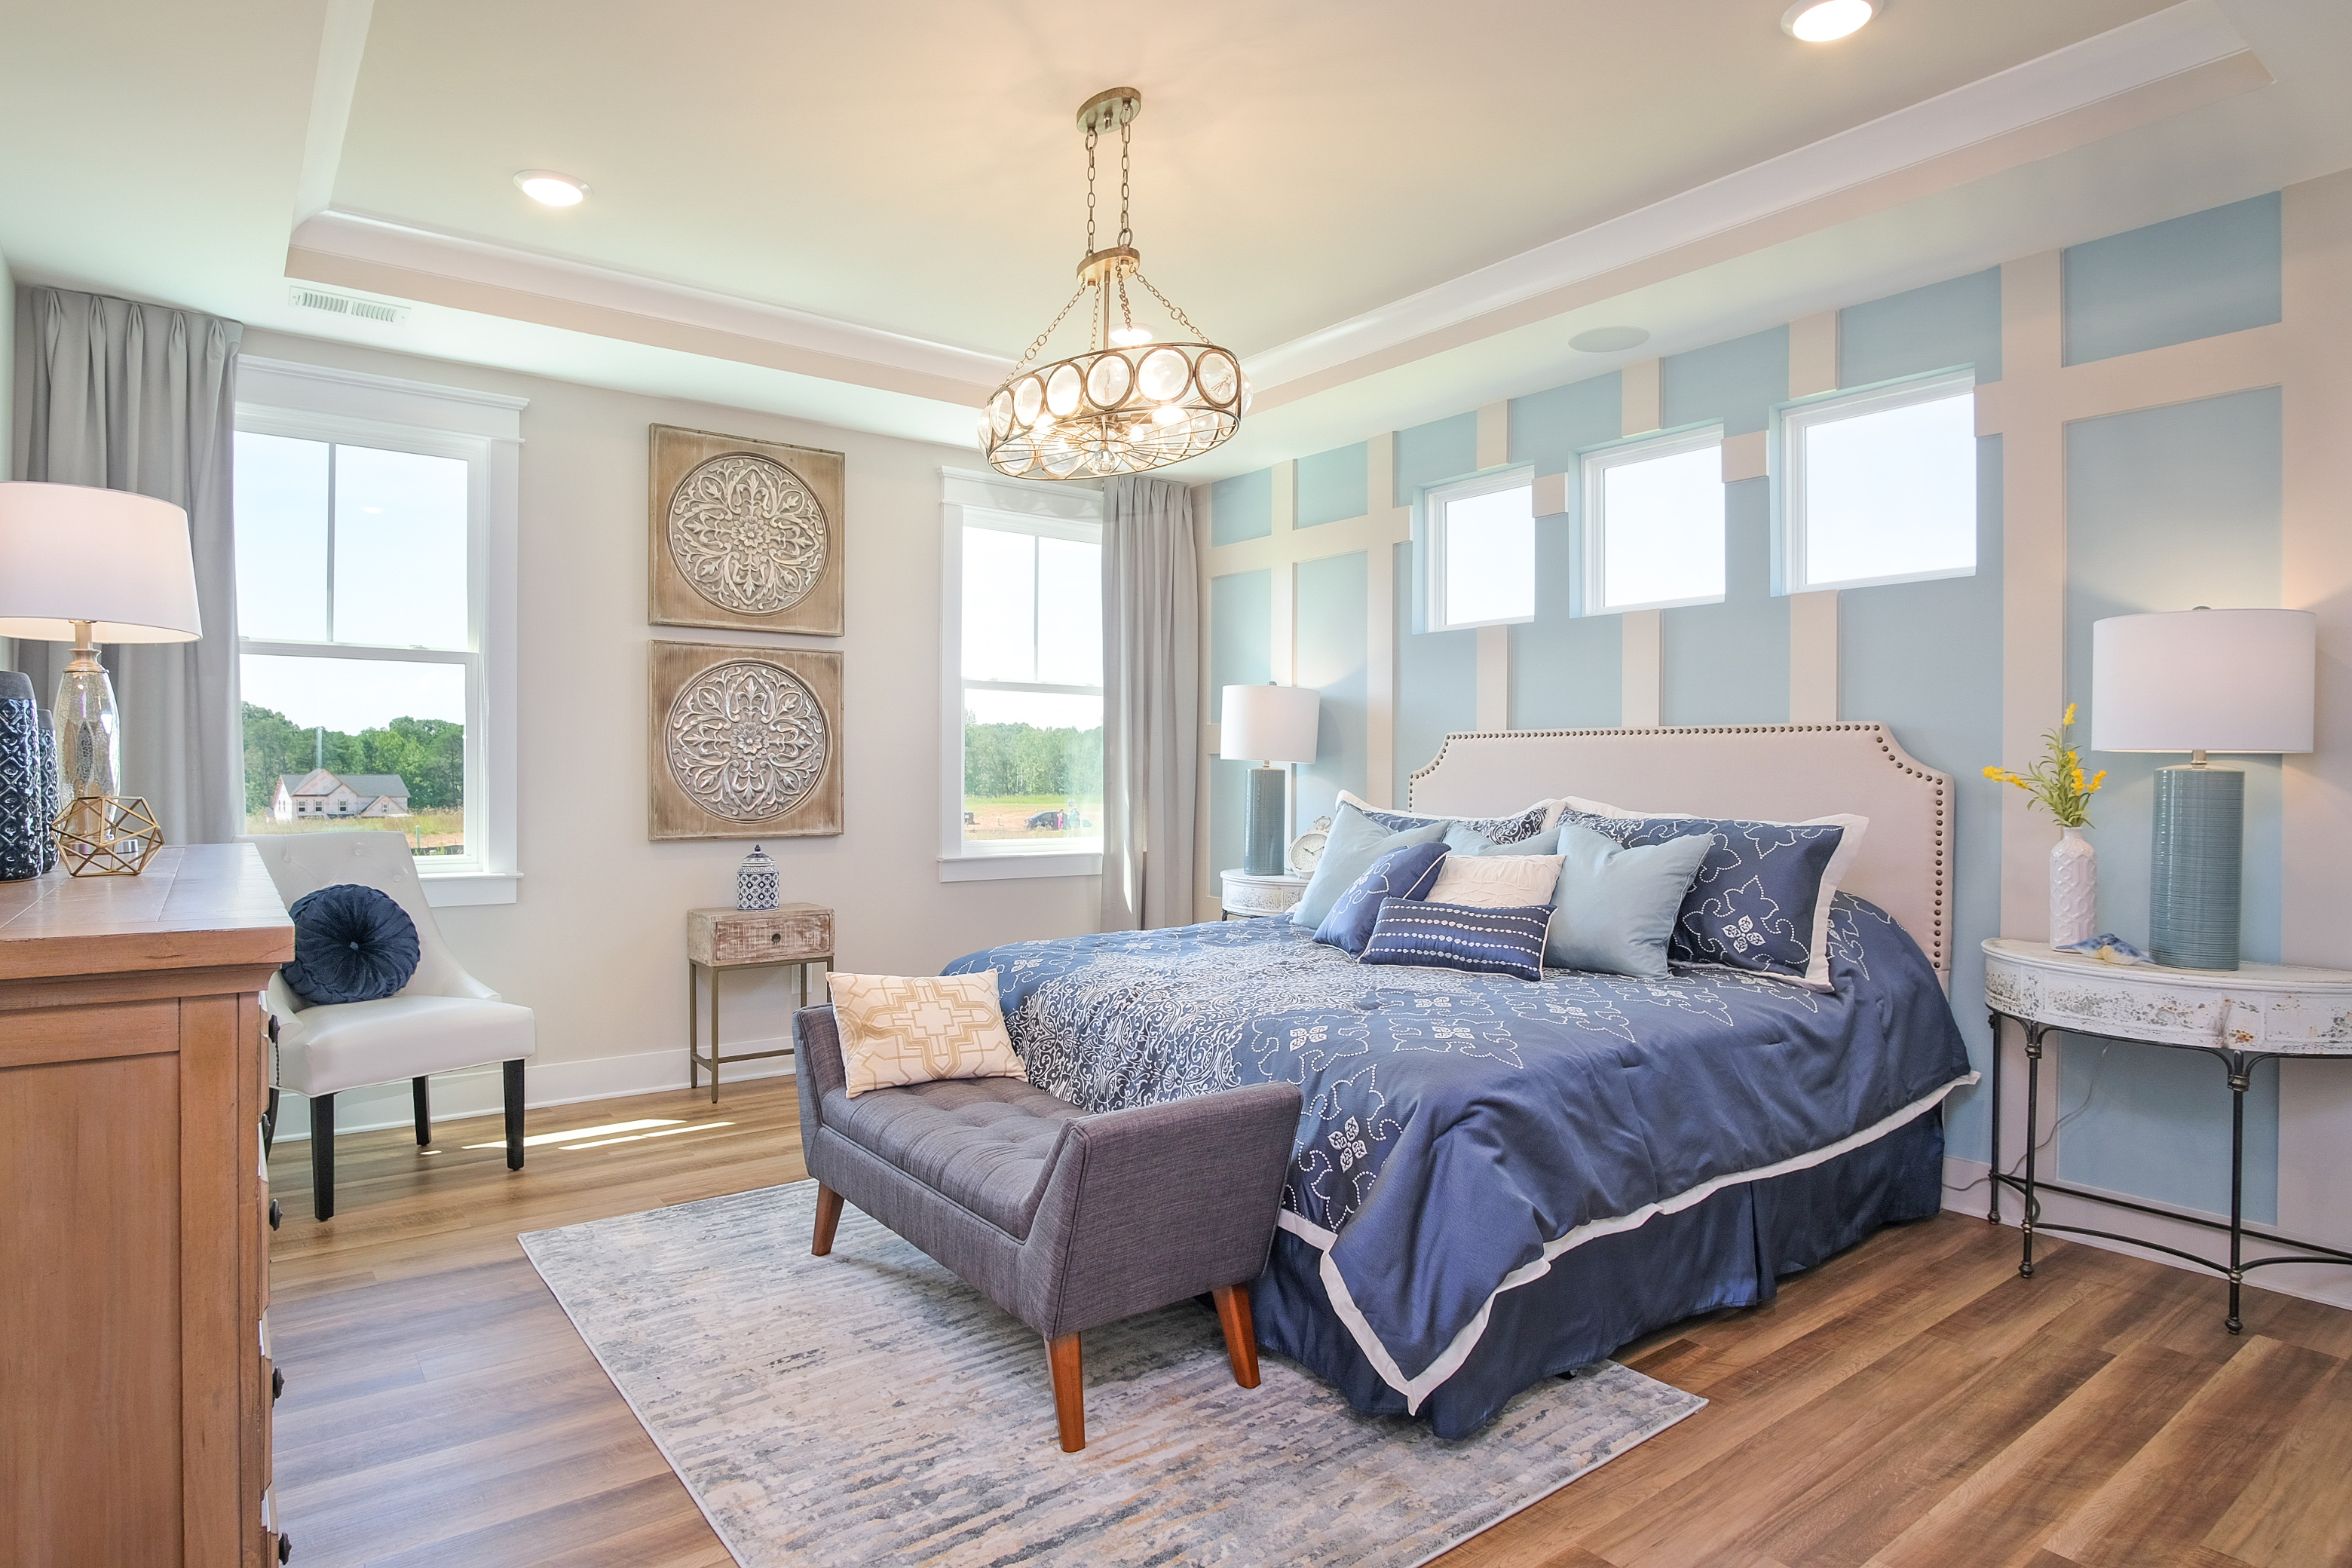 Edgefield Owner's Bedroom